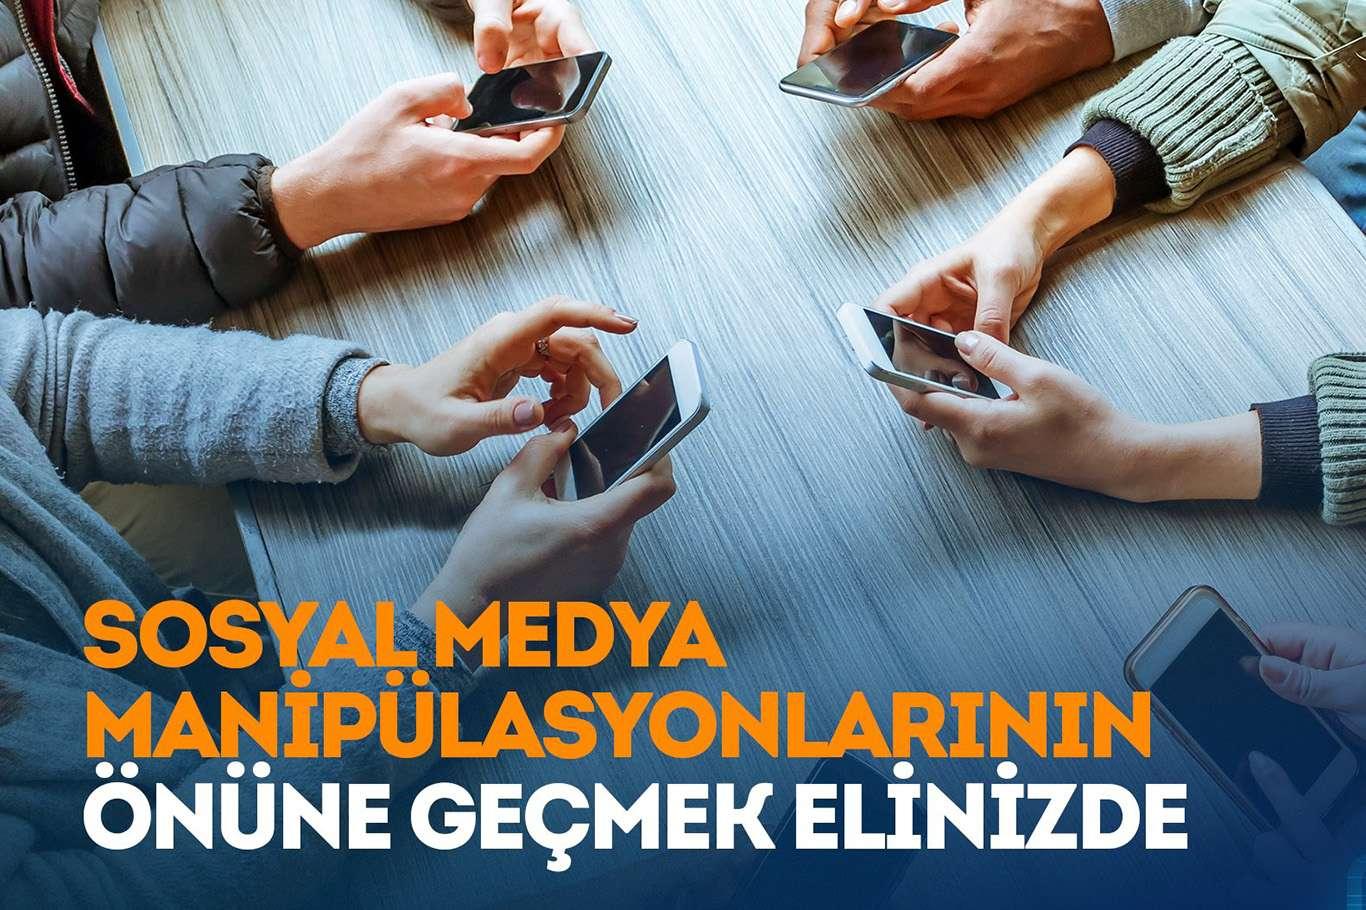 SOSYAL MEDYA HESAPLARINA DİKKAT